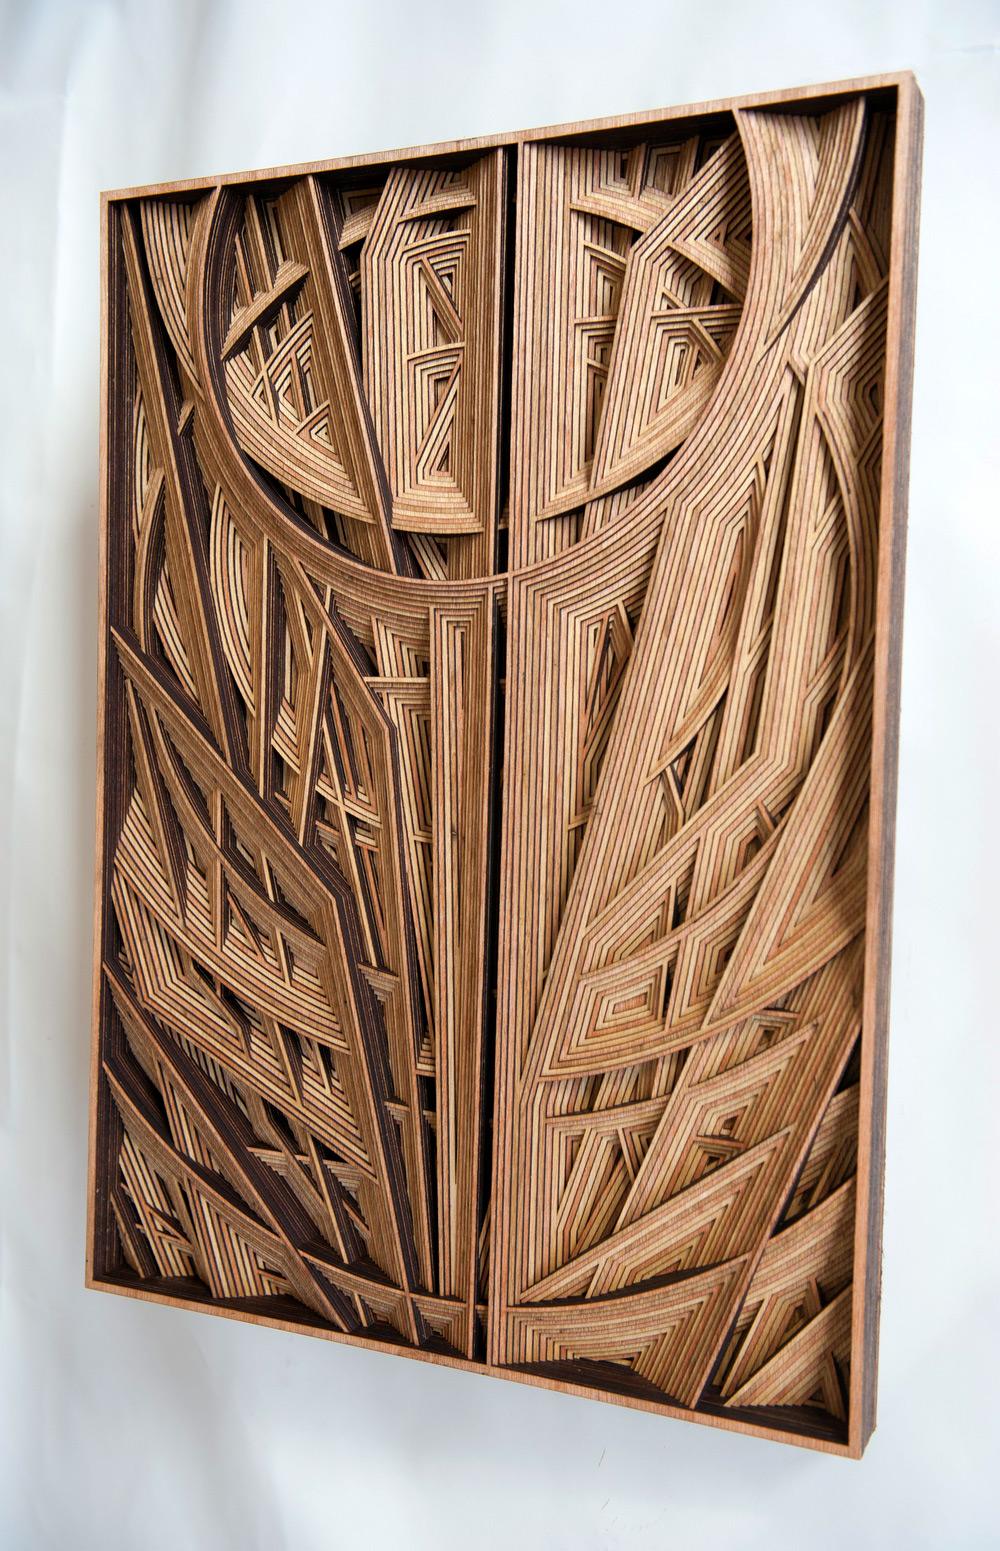 Geometric LaserCut Wood Relief Sculptures by Gabriel